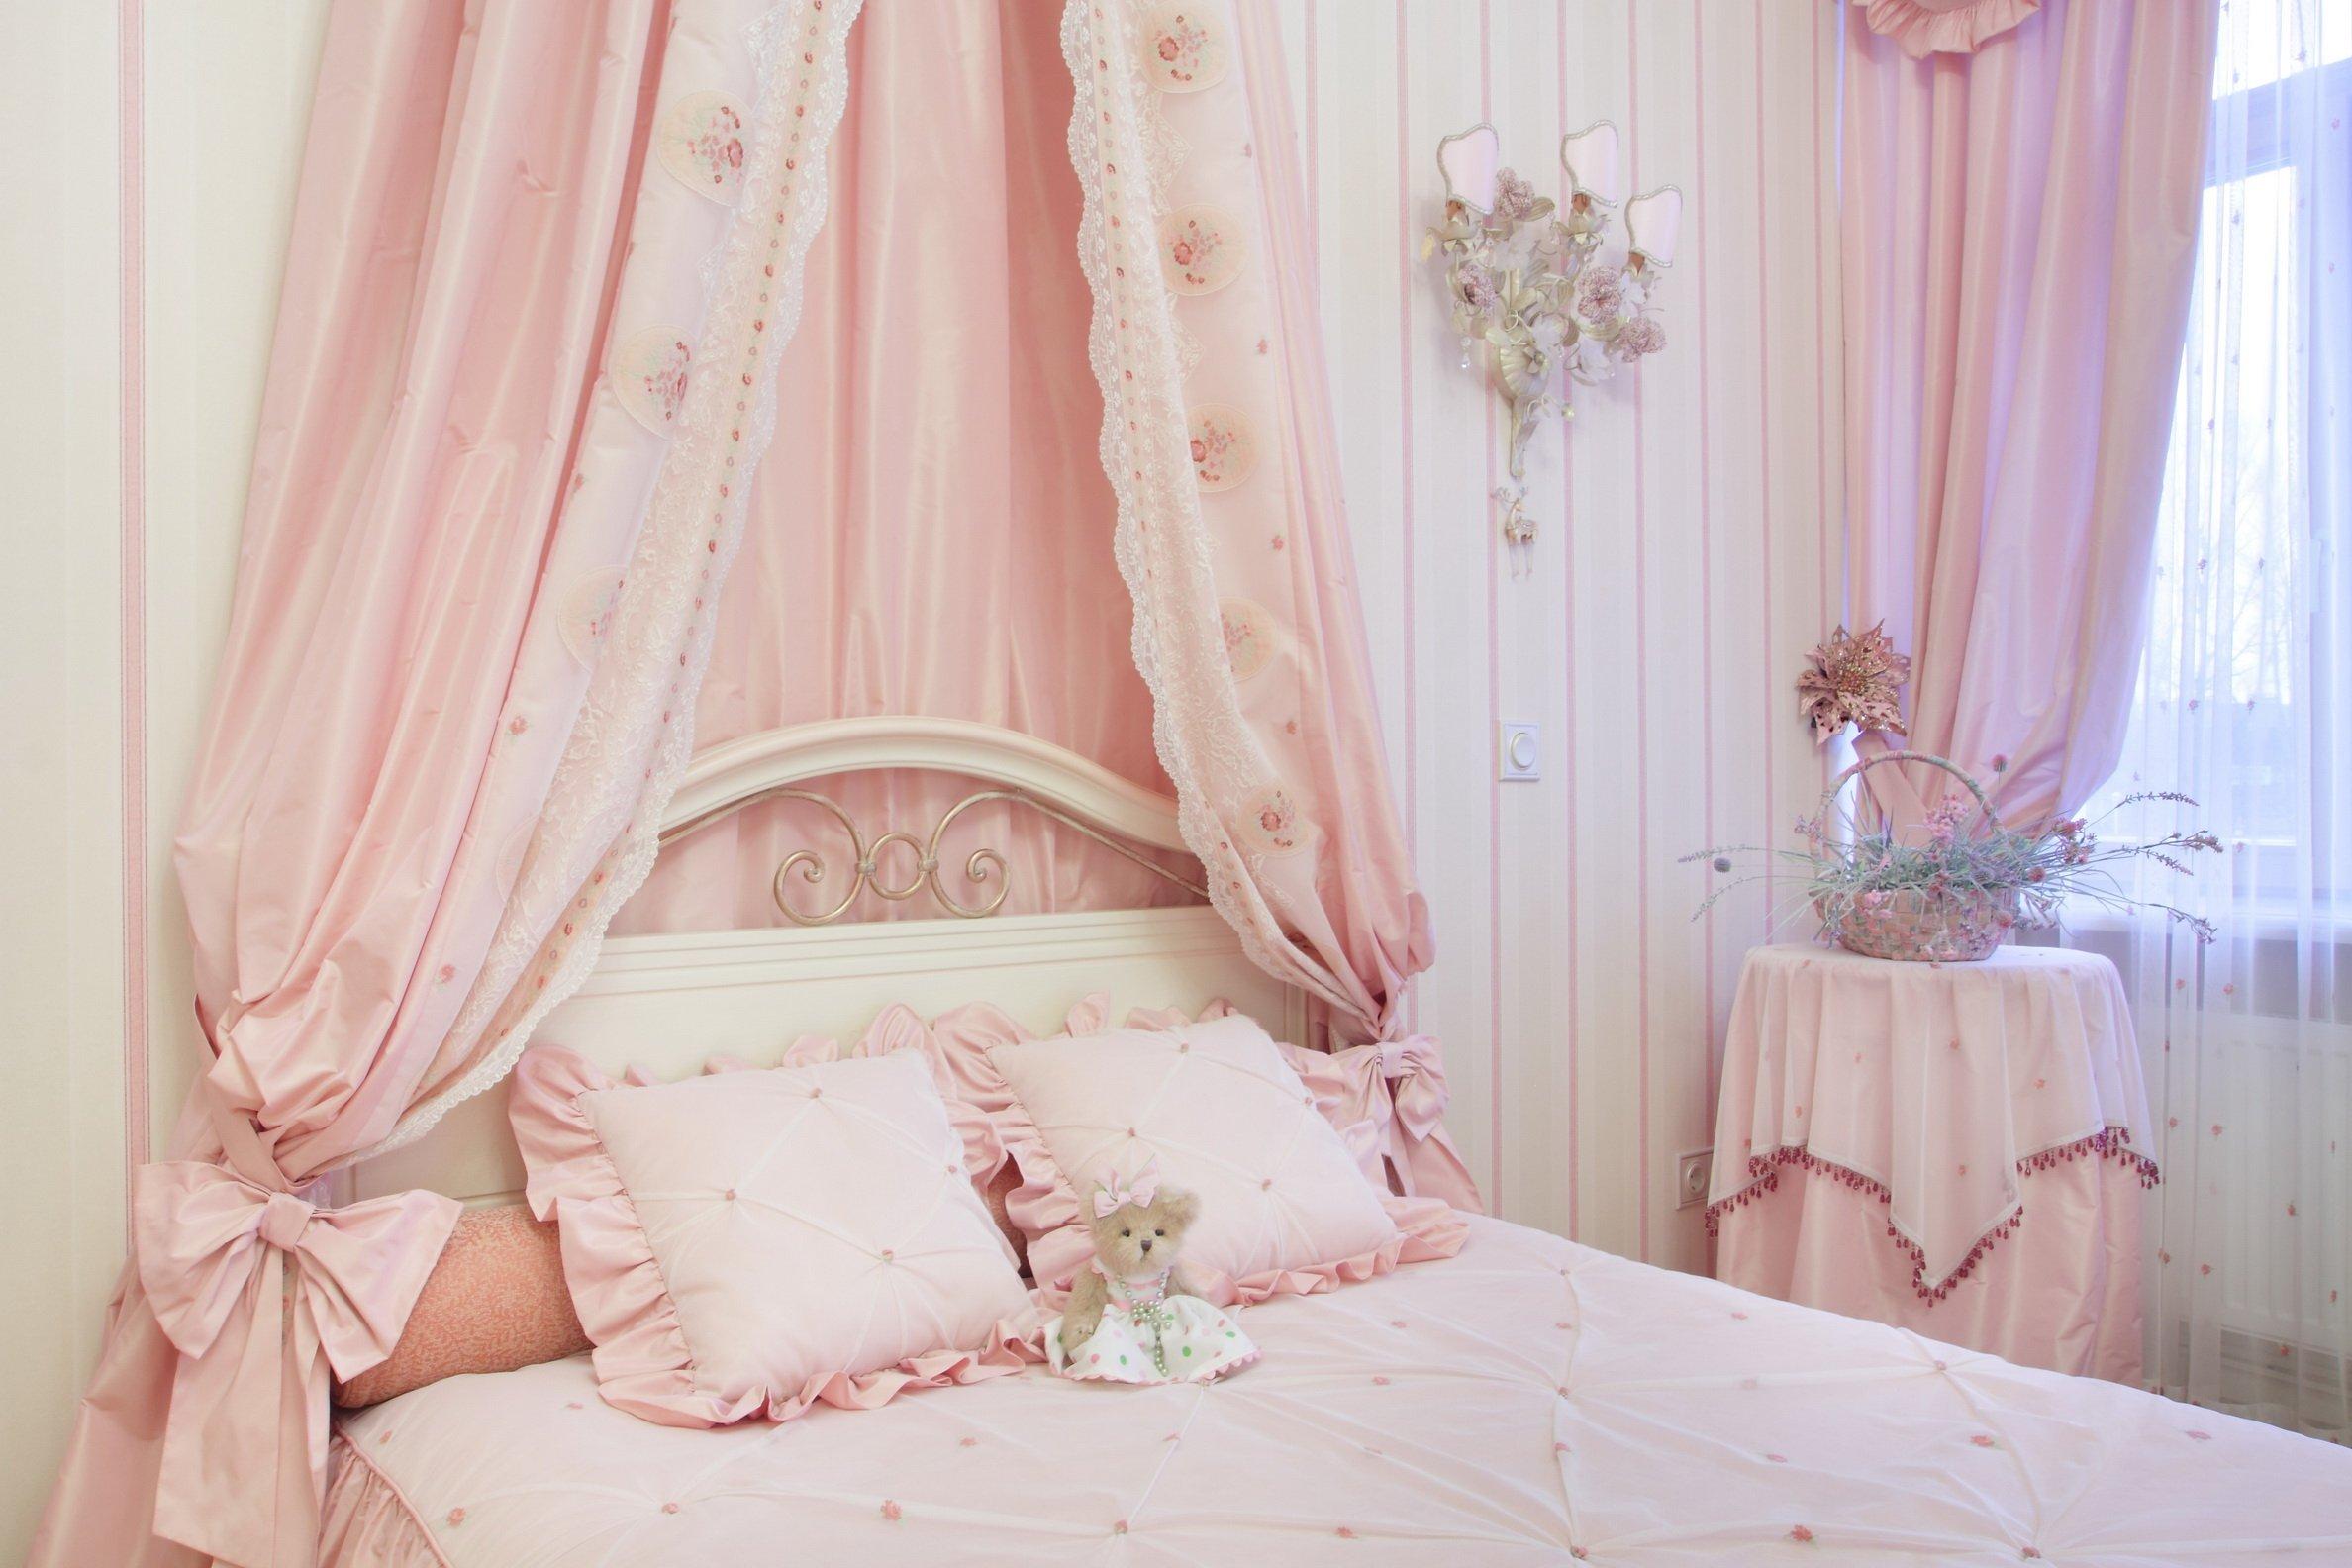 служба занавески в розовую спальню фото вам предстоит